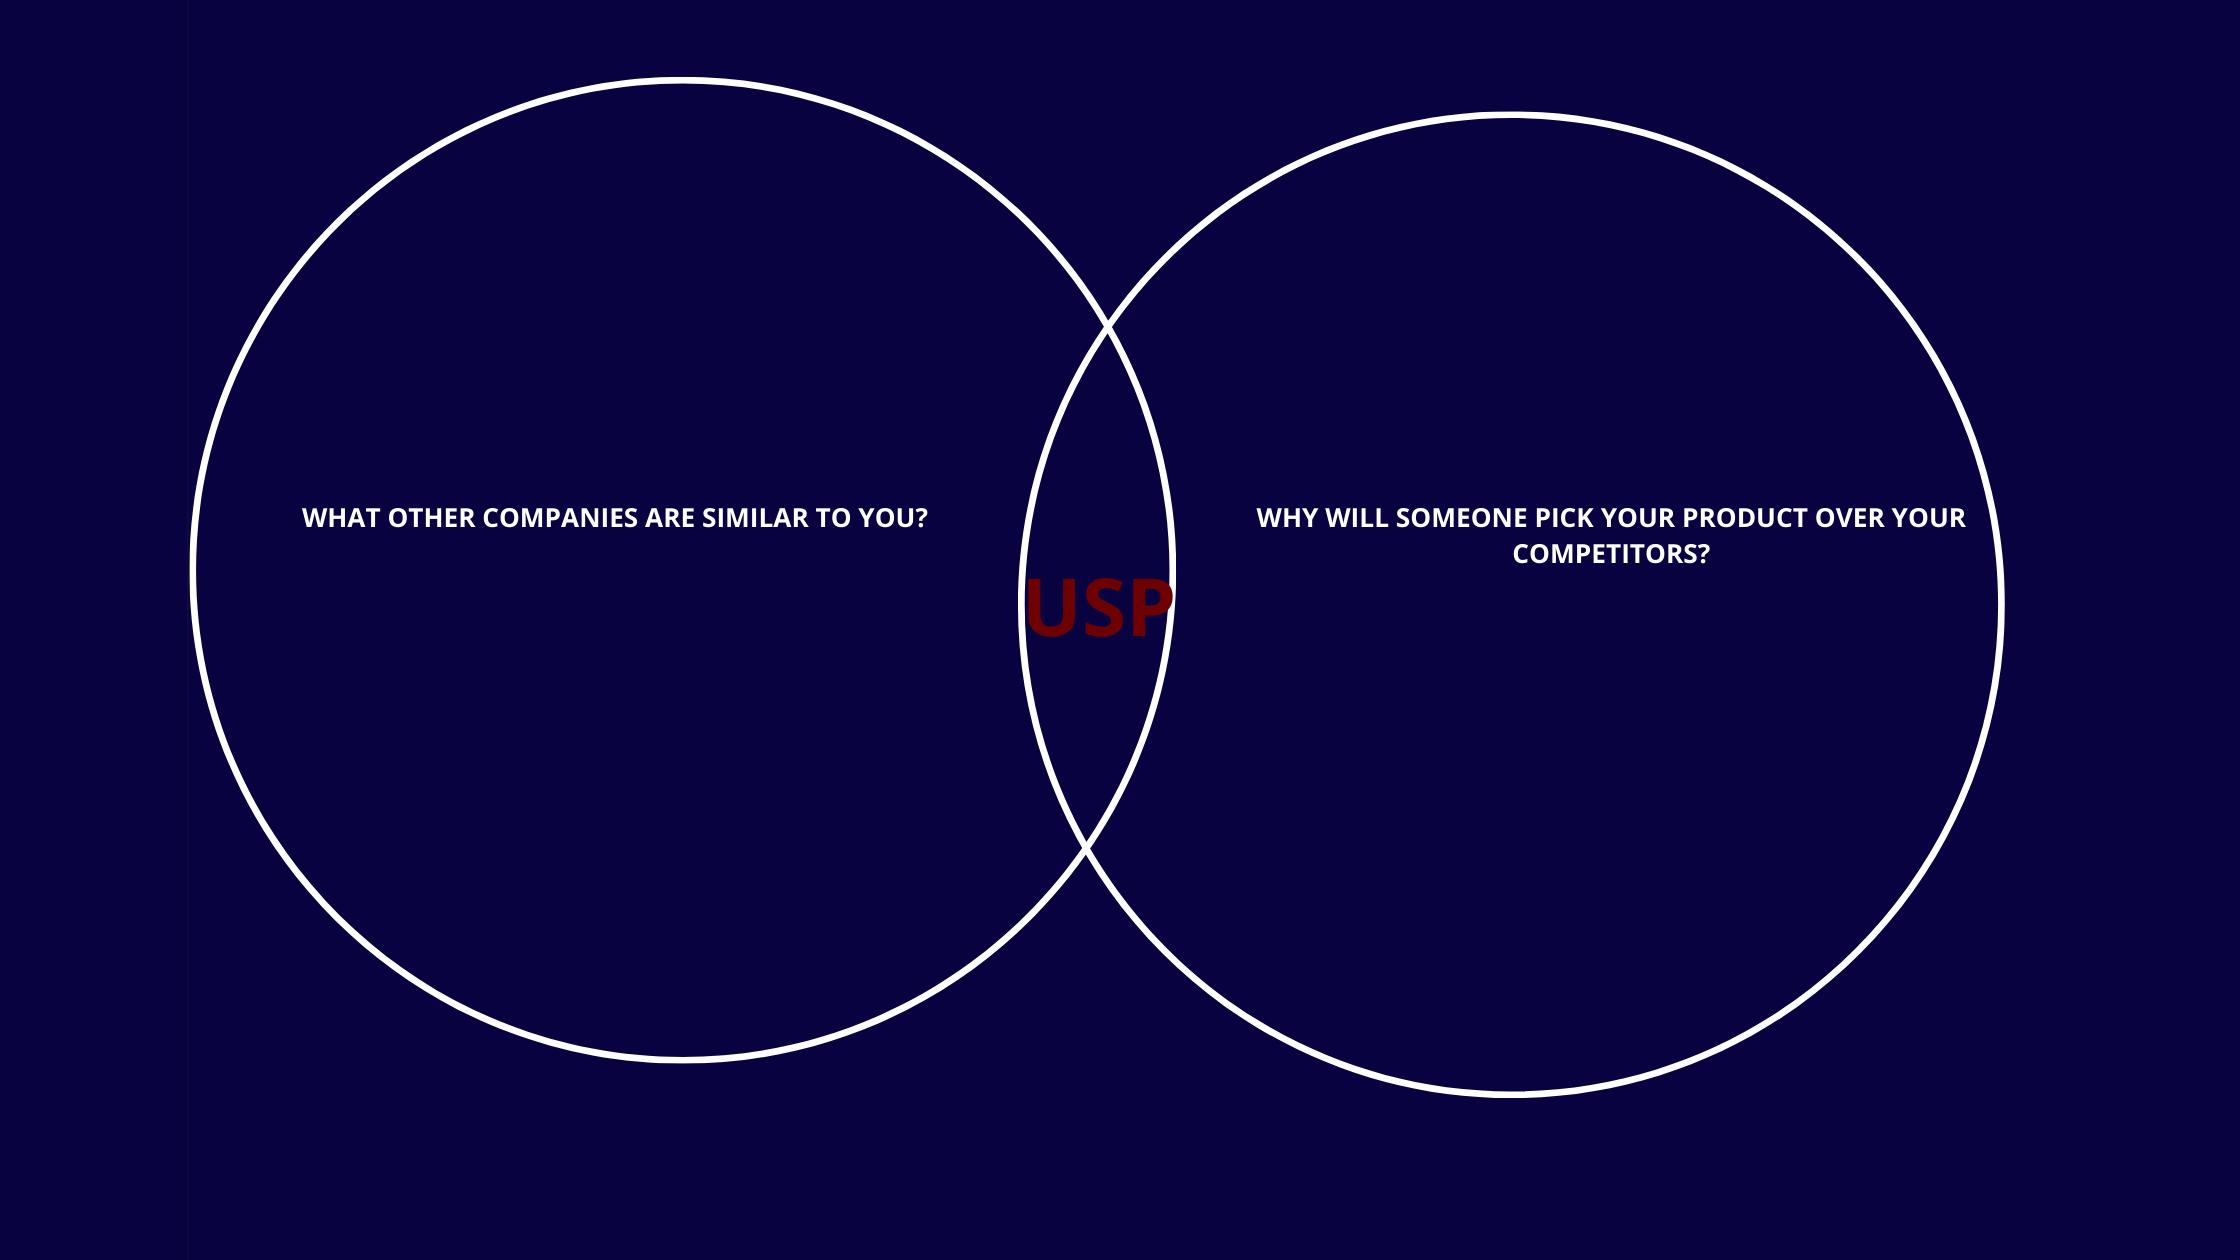 An illustration on USP